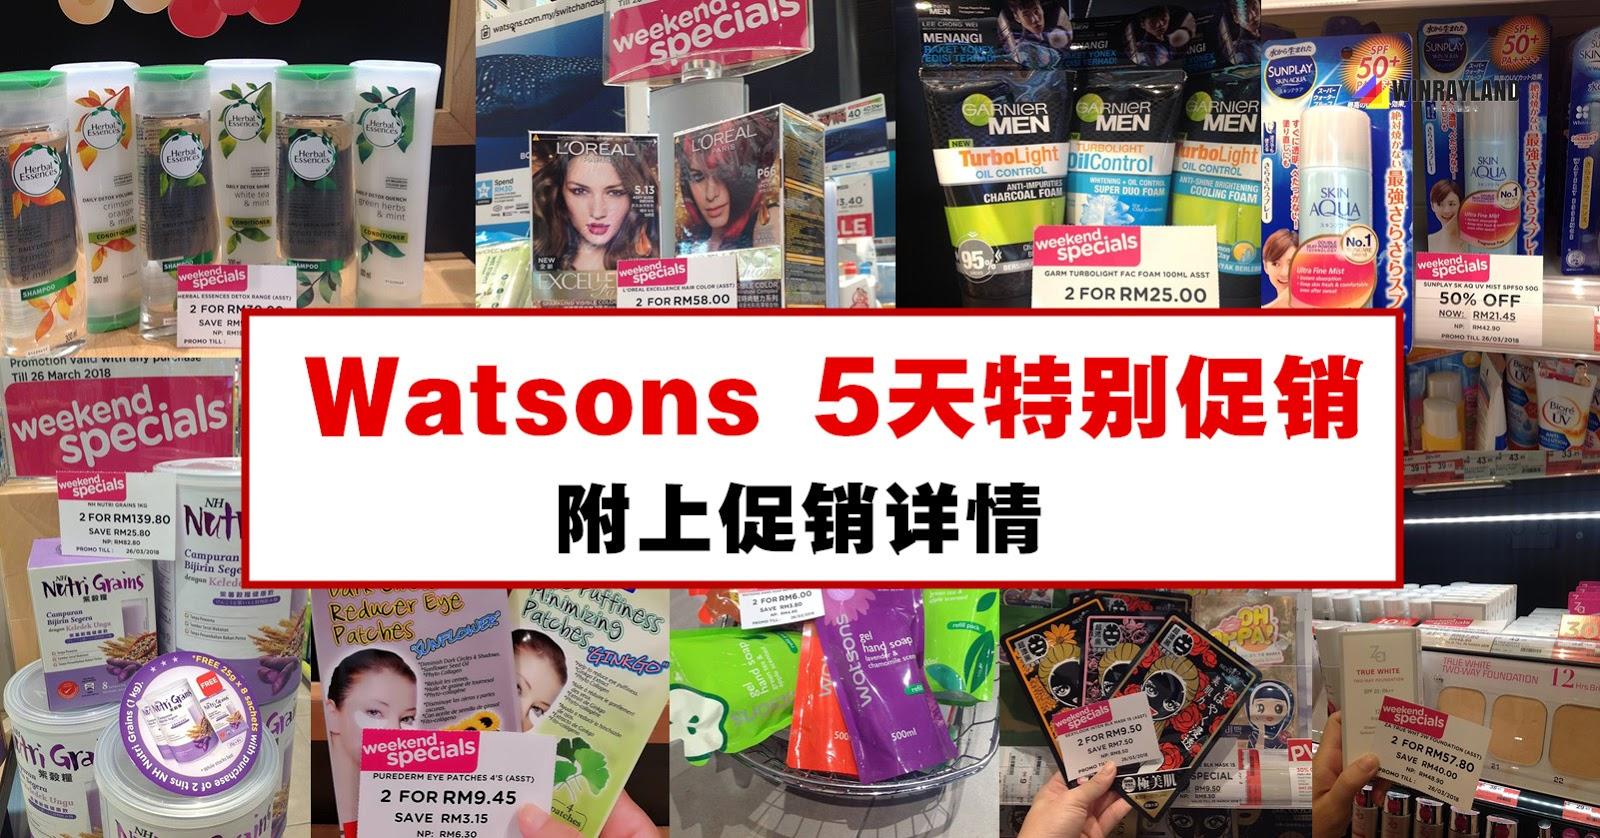 Watsons 5天特别促销